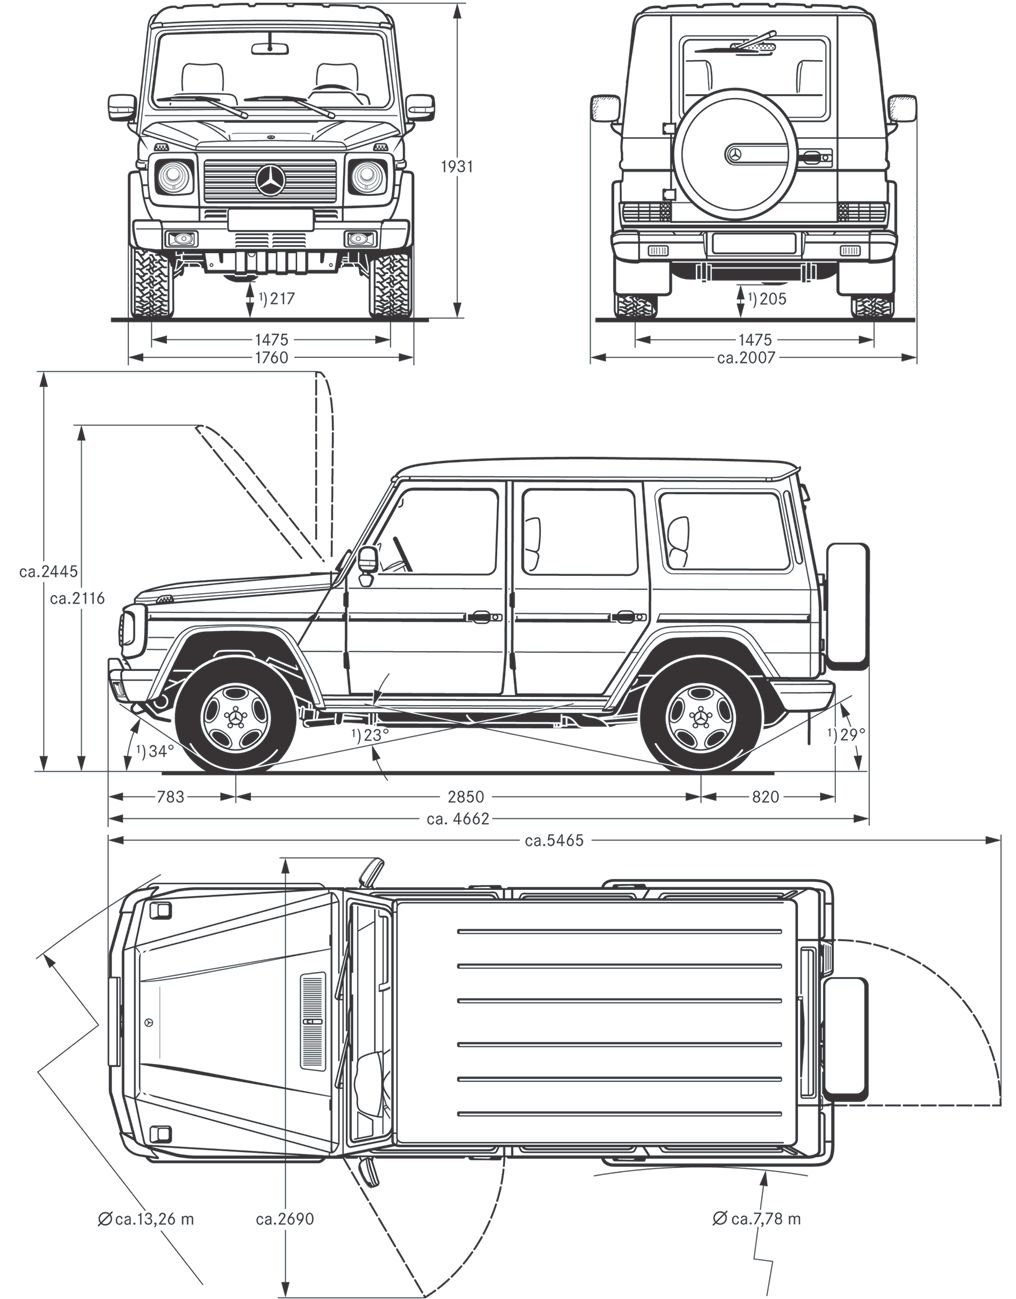 16-dimensions-exterieures-version-break-long-g320-cdi-mercedes-classe-g-463.jpg